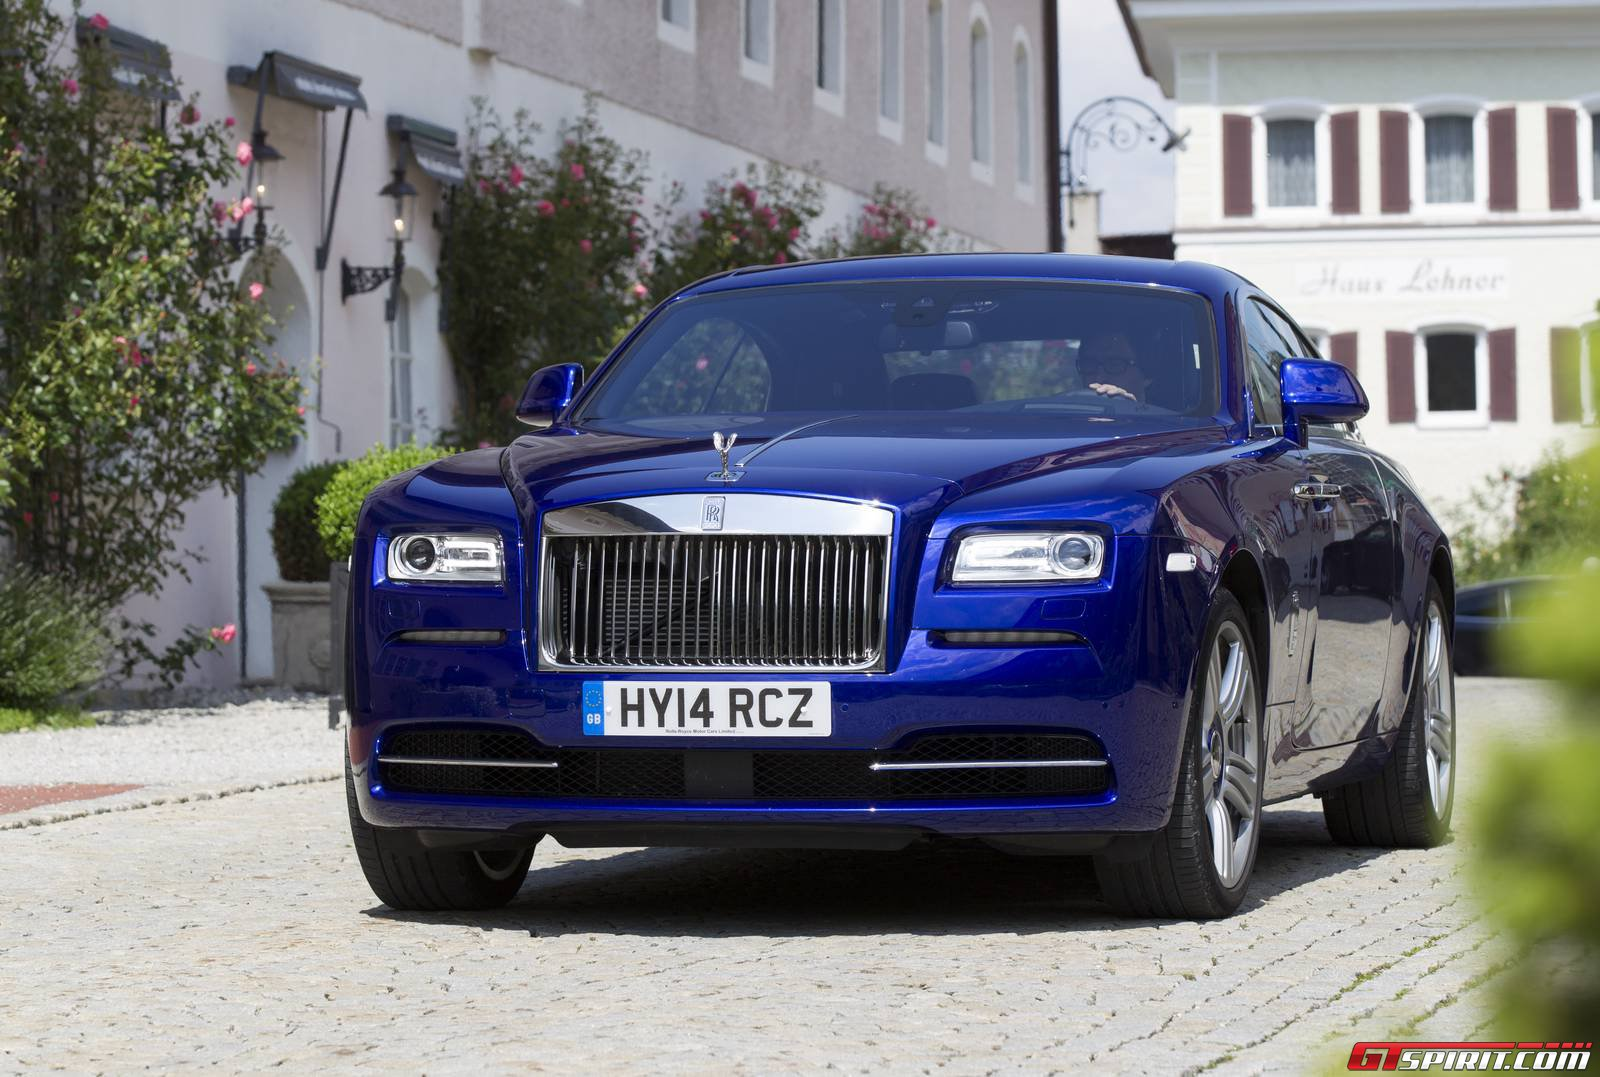 Rolls Royce Wraith 0 60 >> Lastcarnews: Special Report: Rolls-Royce Wraith, Ghost and Phantom Comparison Tour